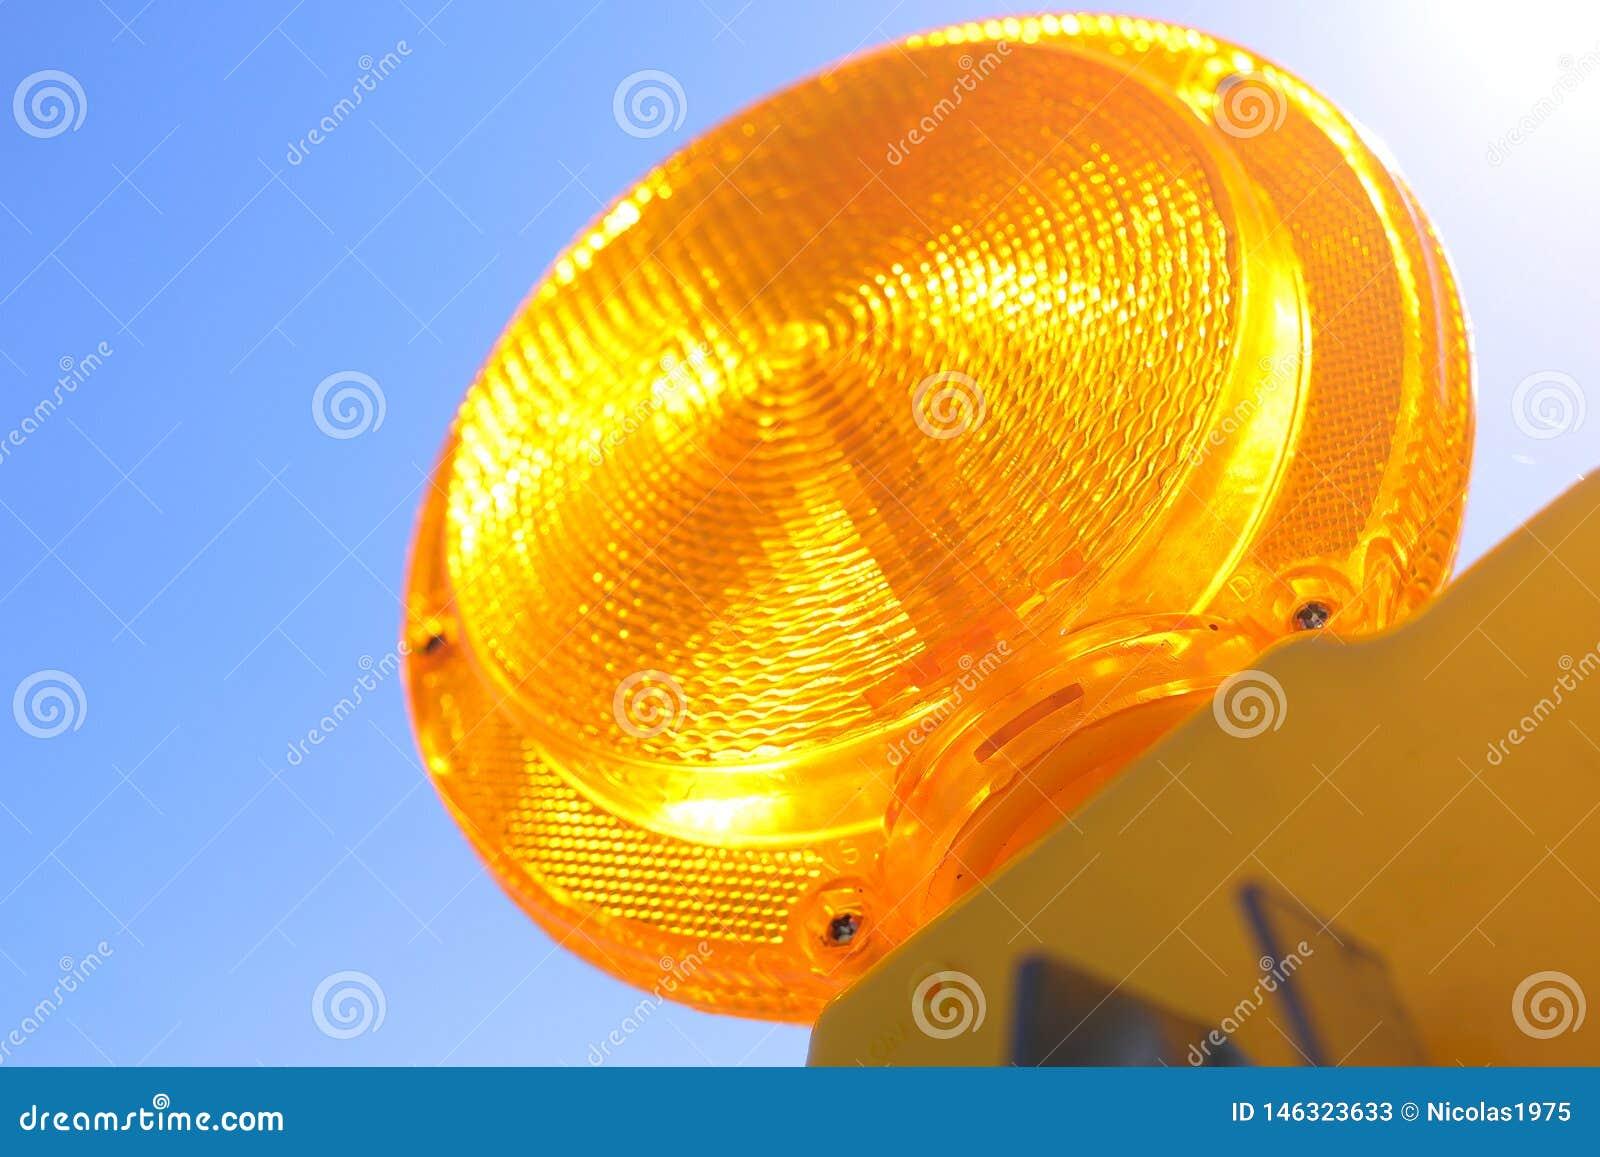 Lampe de barricade du trafic